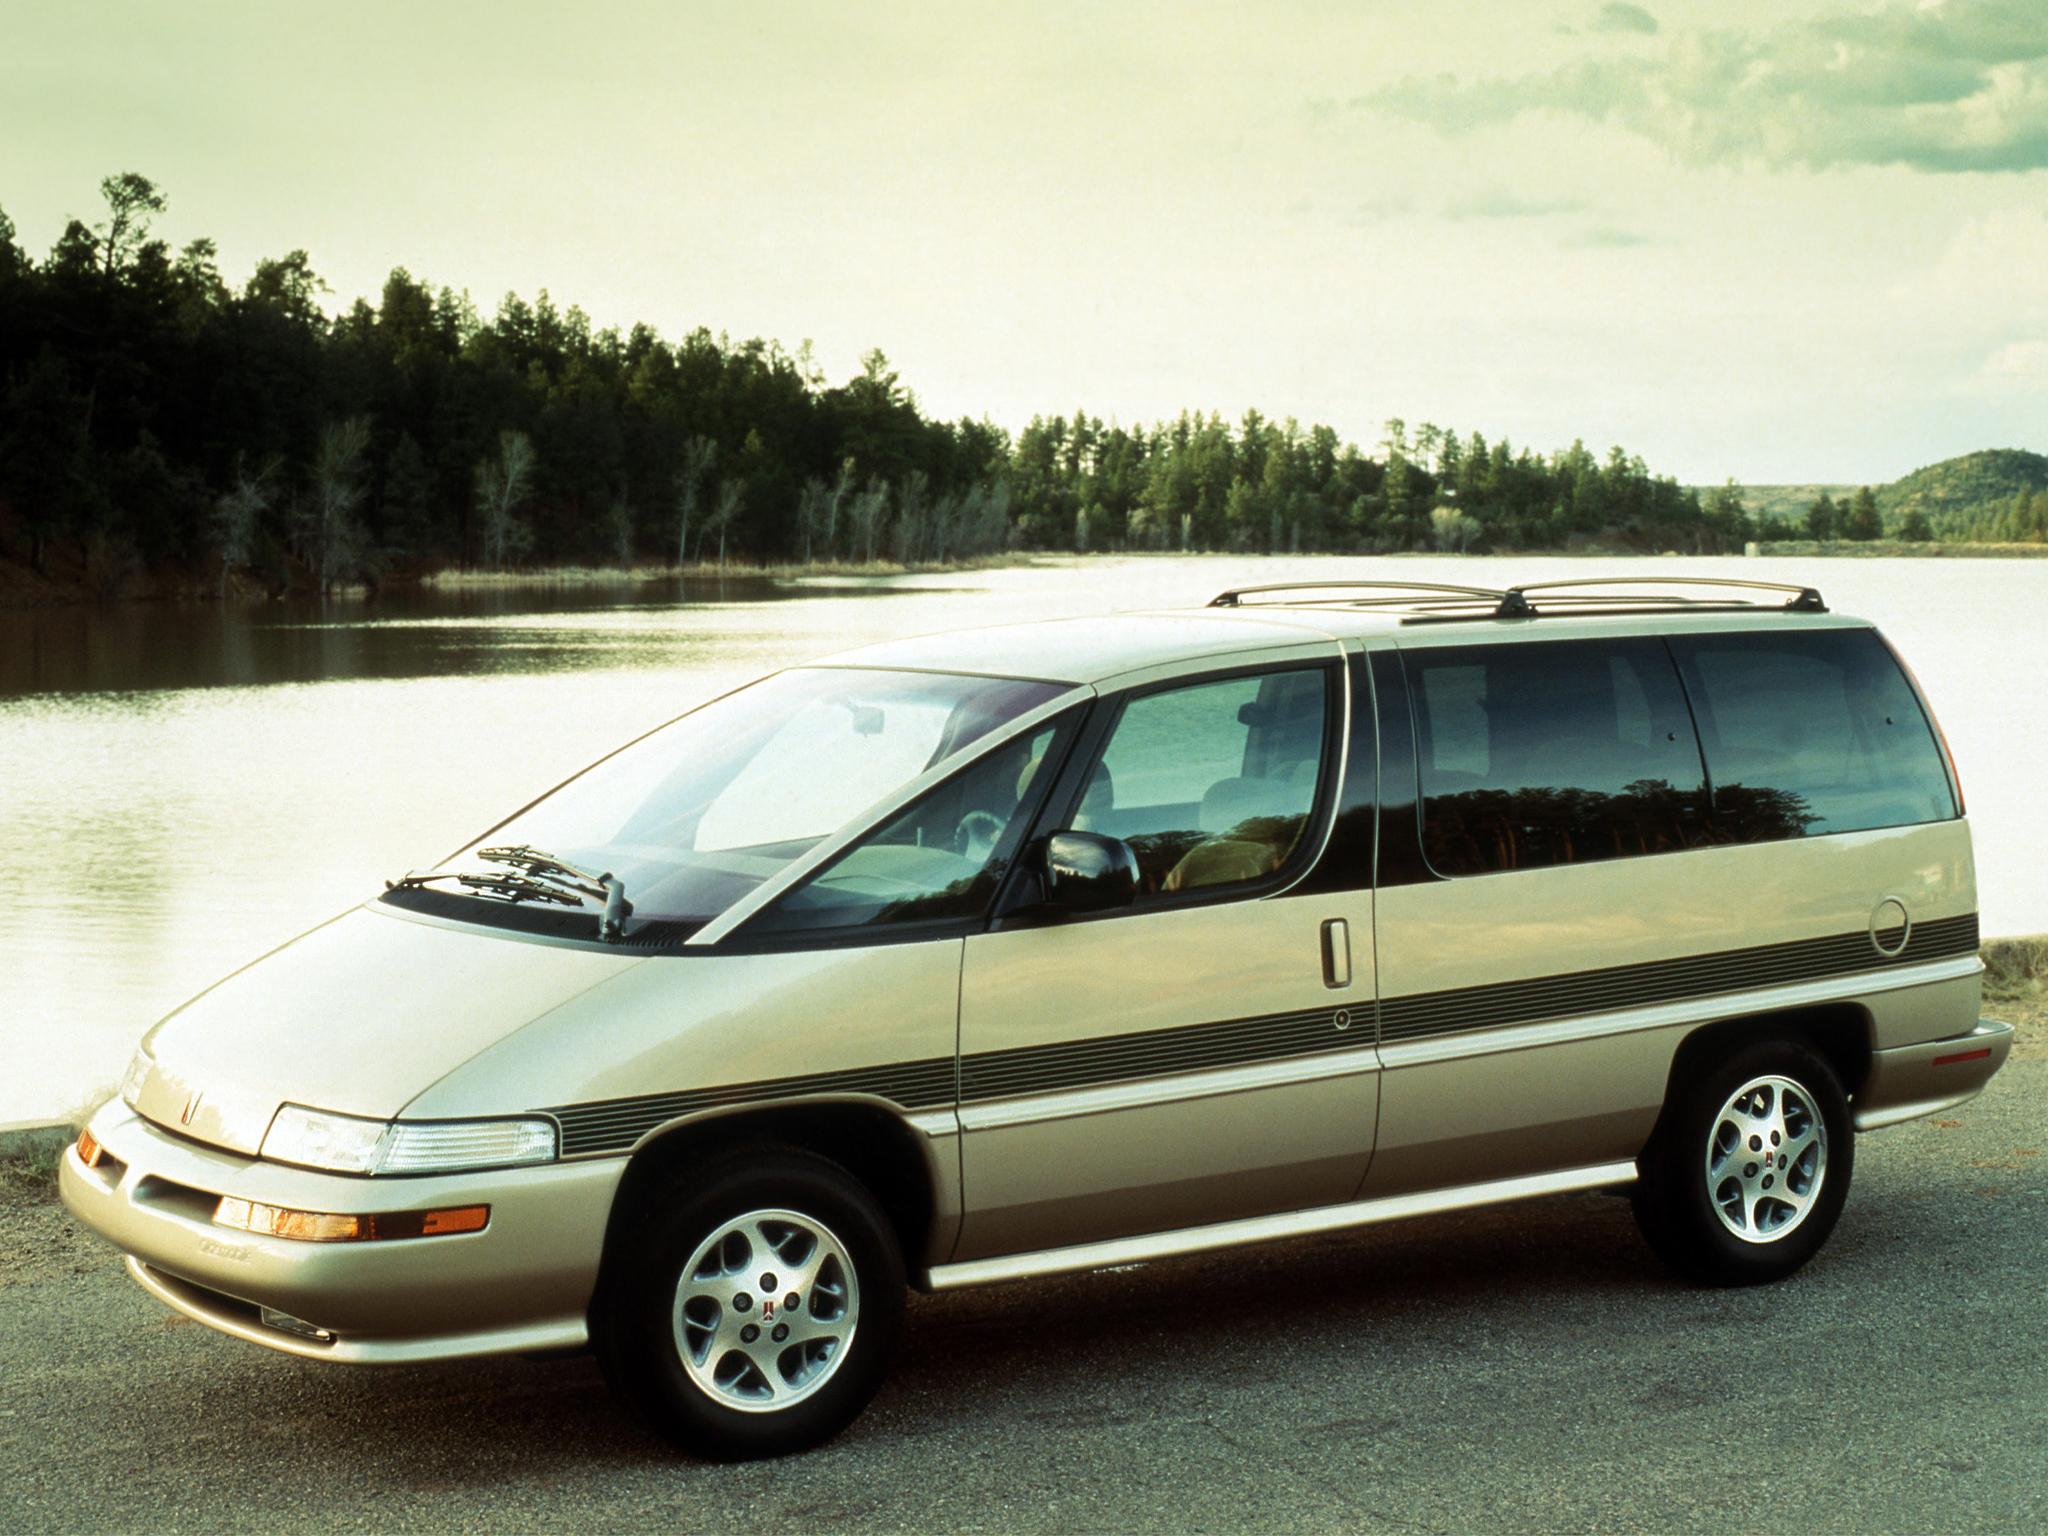 Oldsmobile Silhouette I 1989 - 1996 Minivan #3